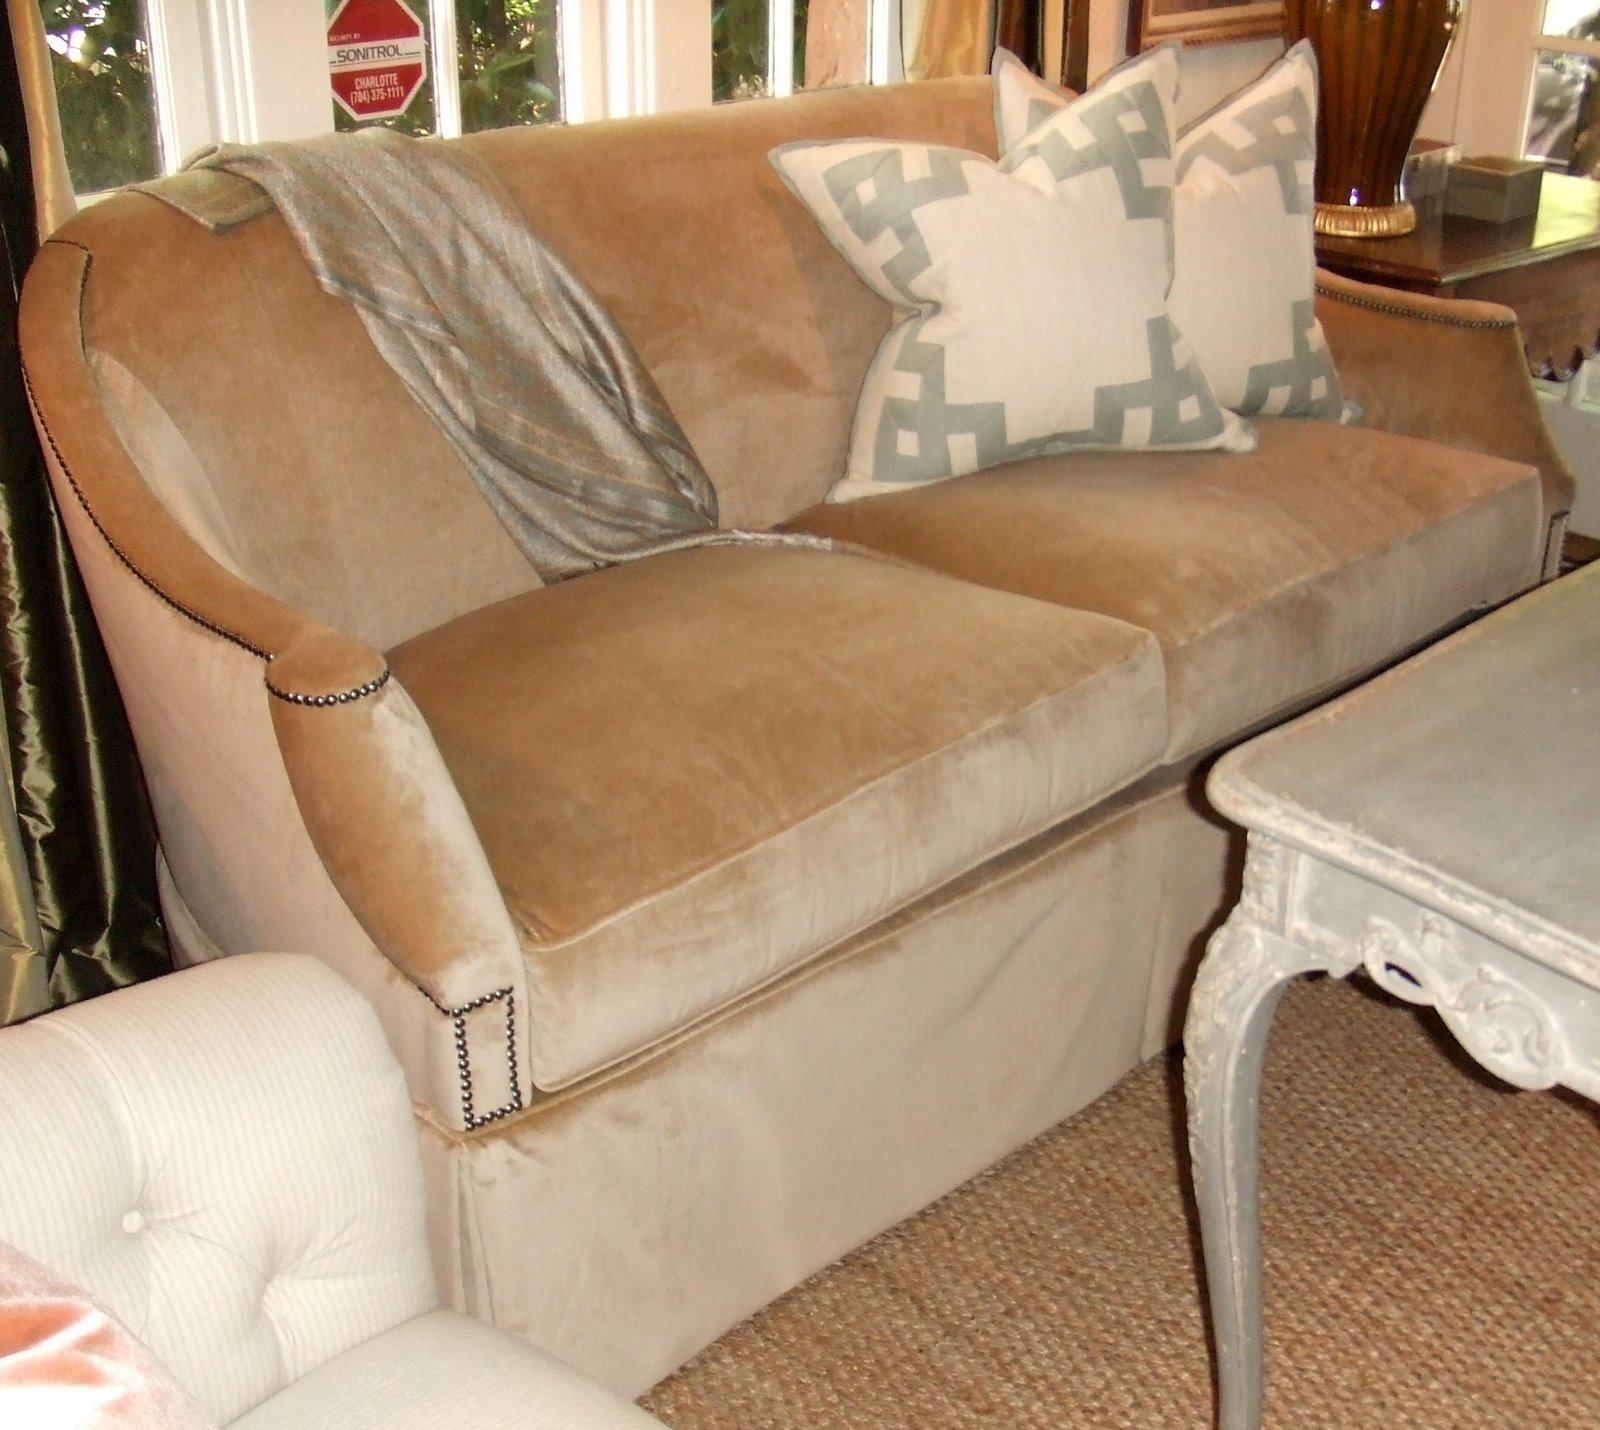 Circa hickory chair sofa for Sectional sofa hickory chair